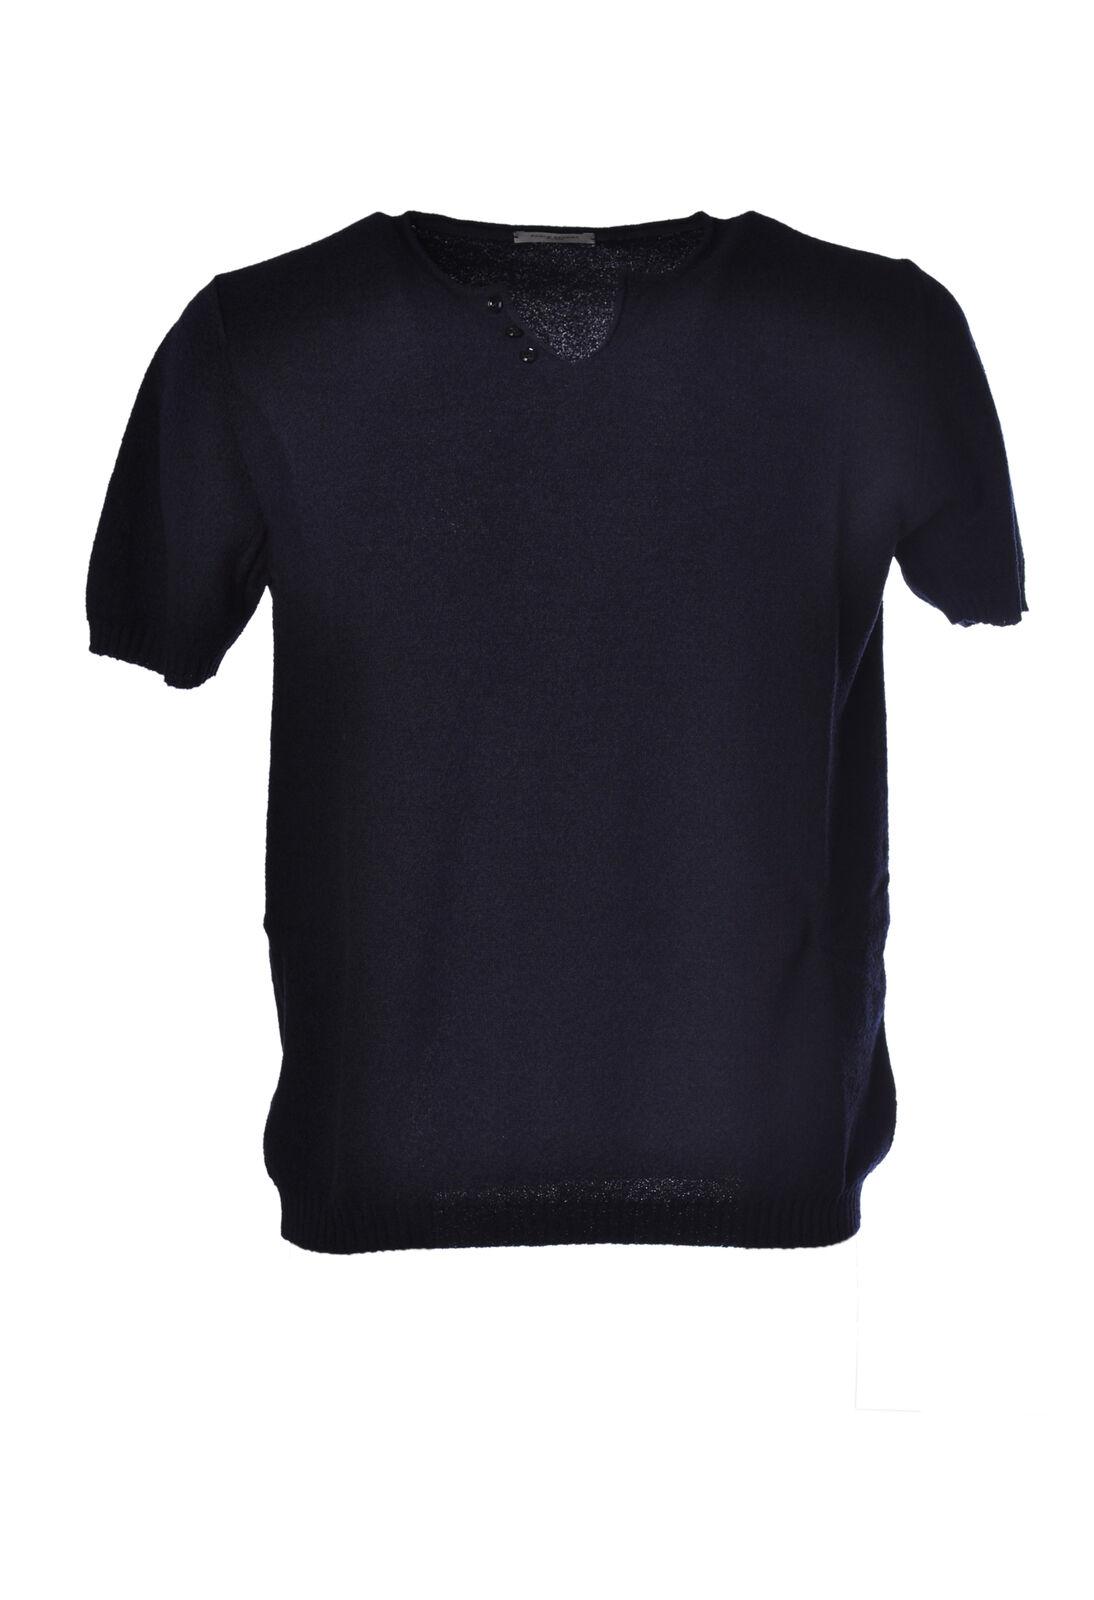 Paolo Pecora - Knitwear-Sweaters - Man - Blau - 1787116F181425